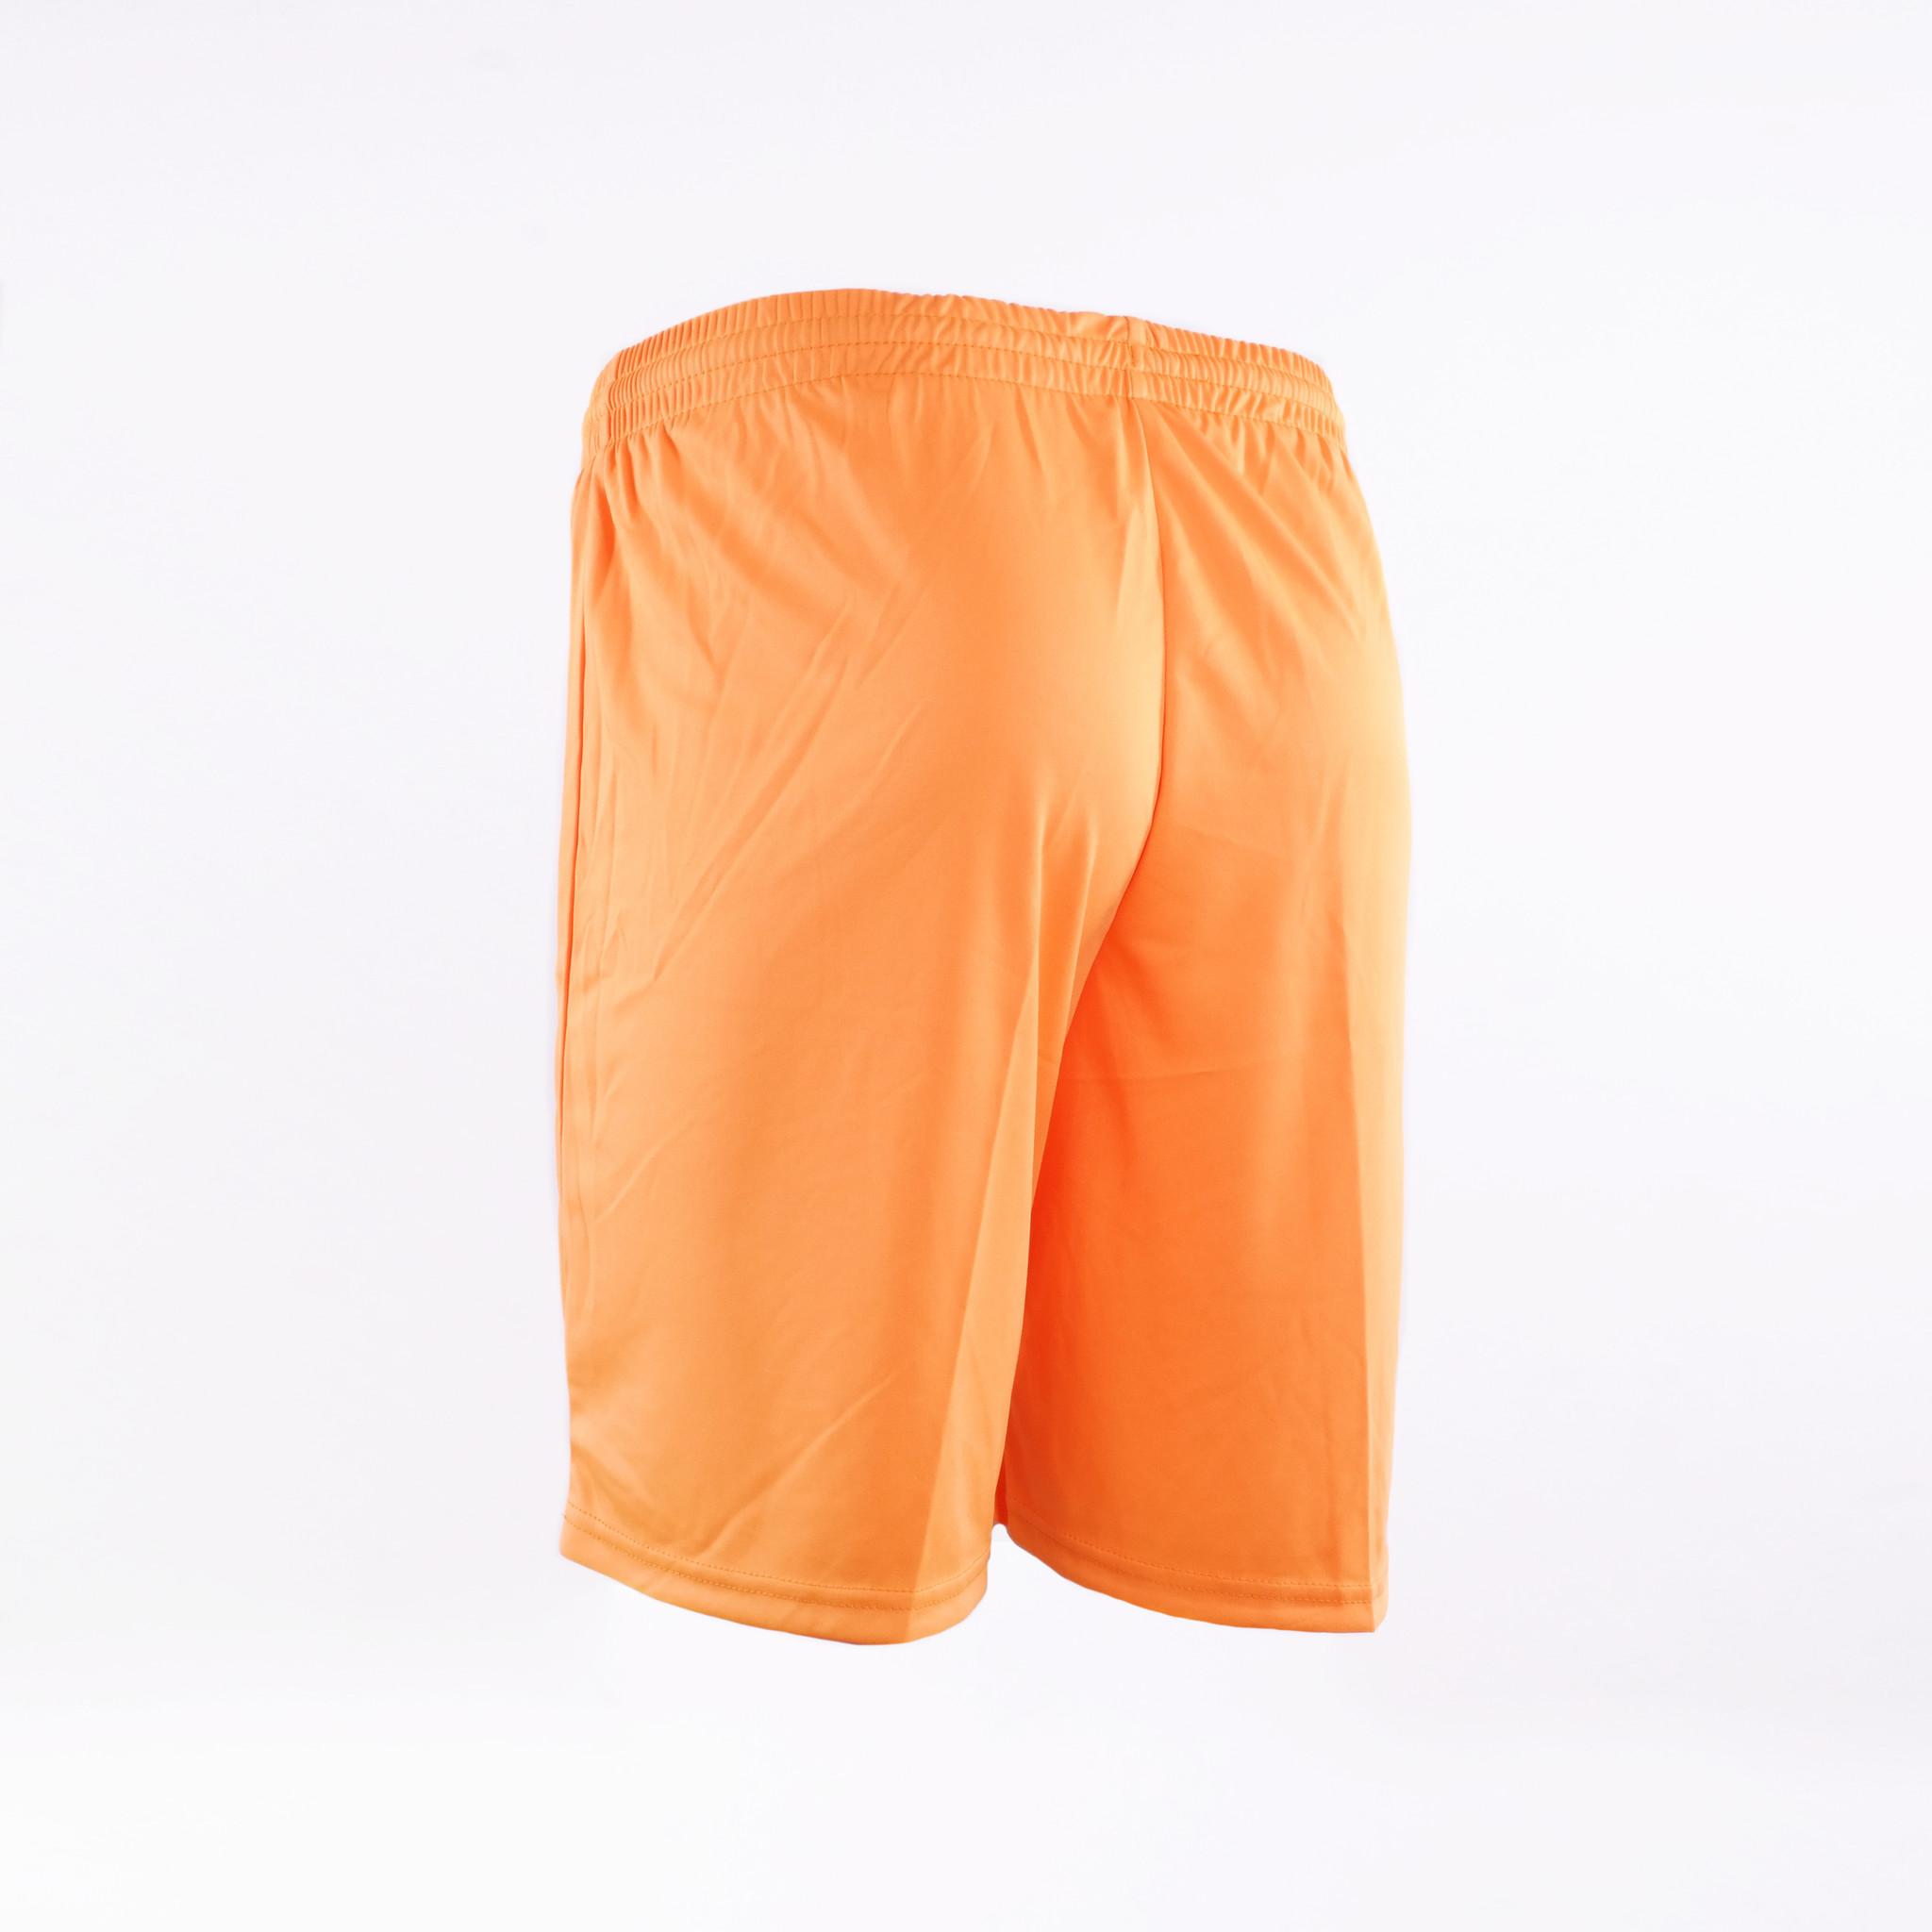 Klupp CAT Keeper Short Neon, Oranje